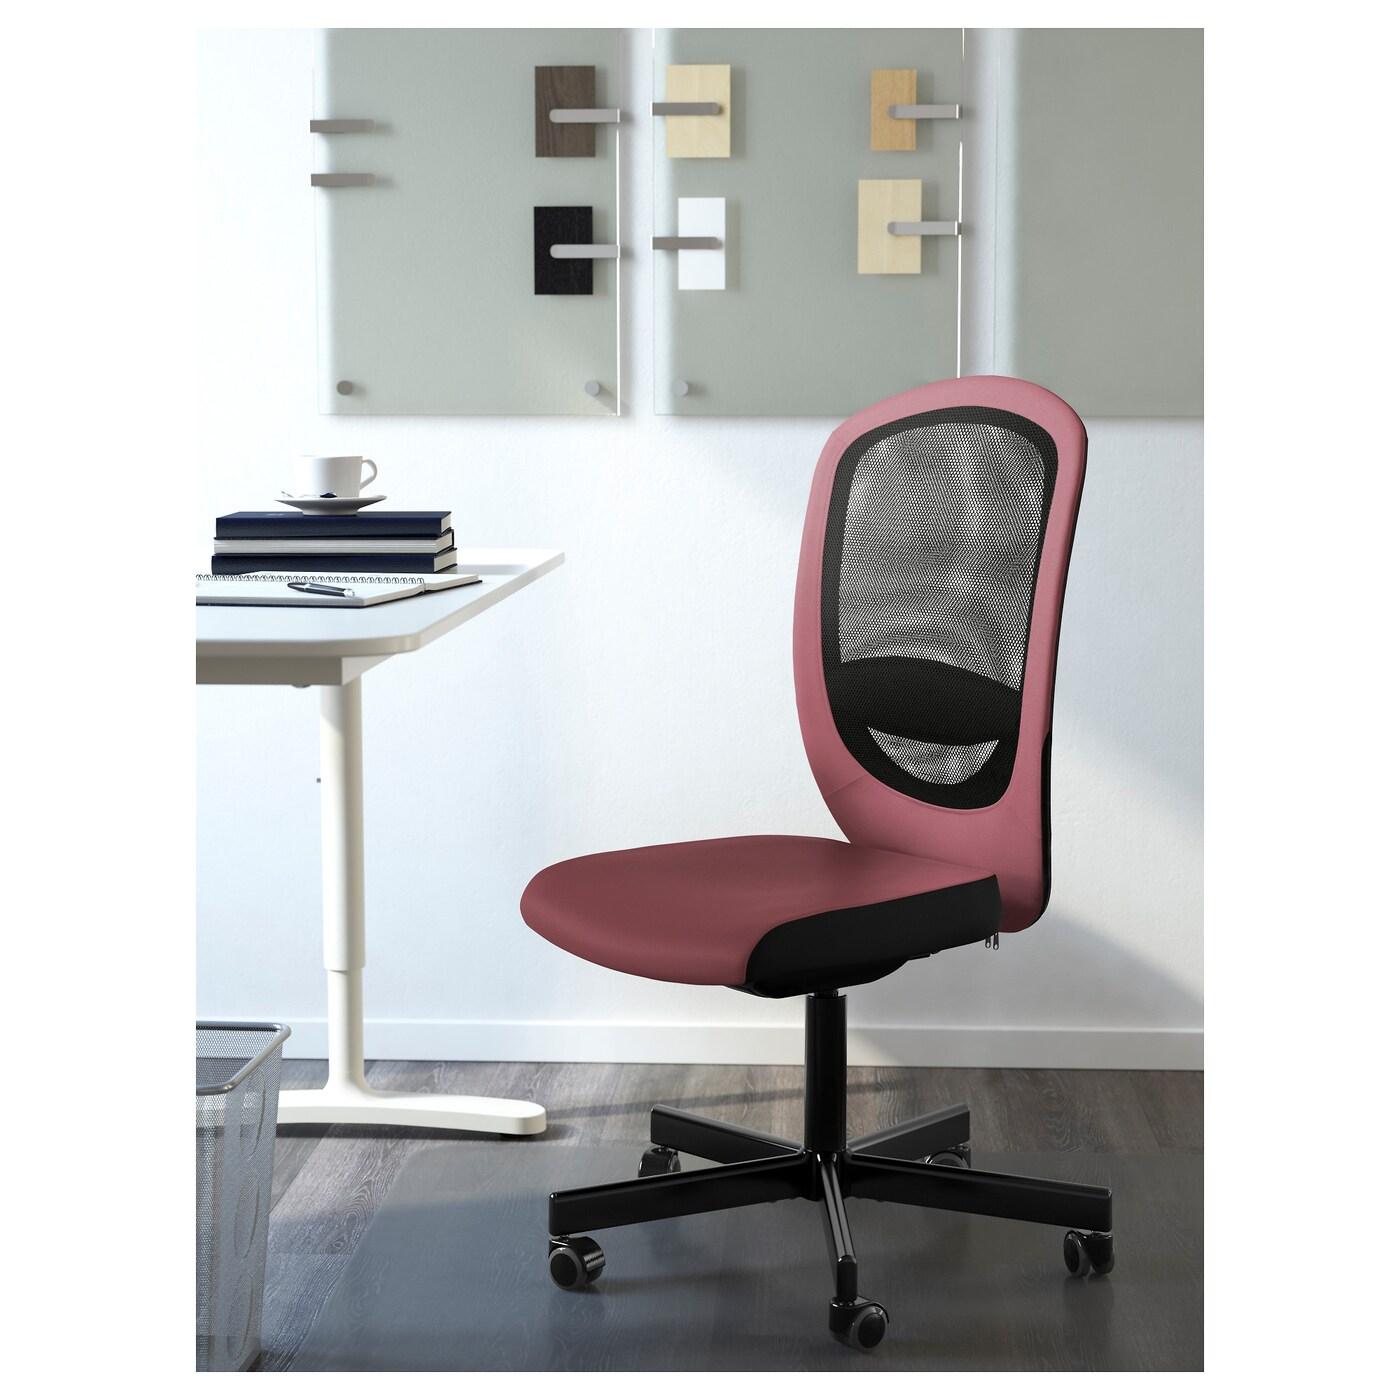 Ikea Flintan Swivel Chair You Sit Comfortably Since The Is Adjule In Height